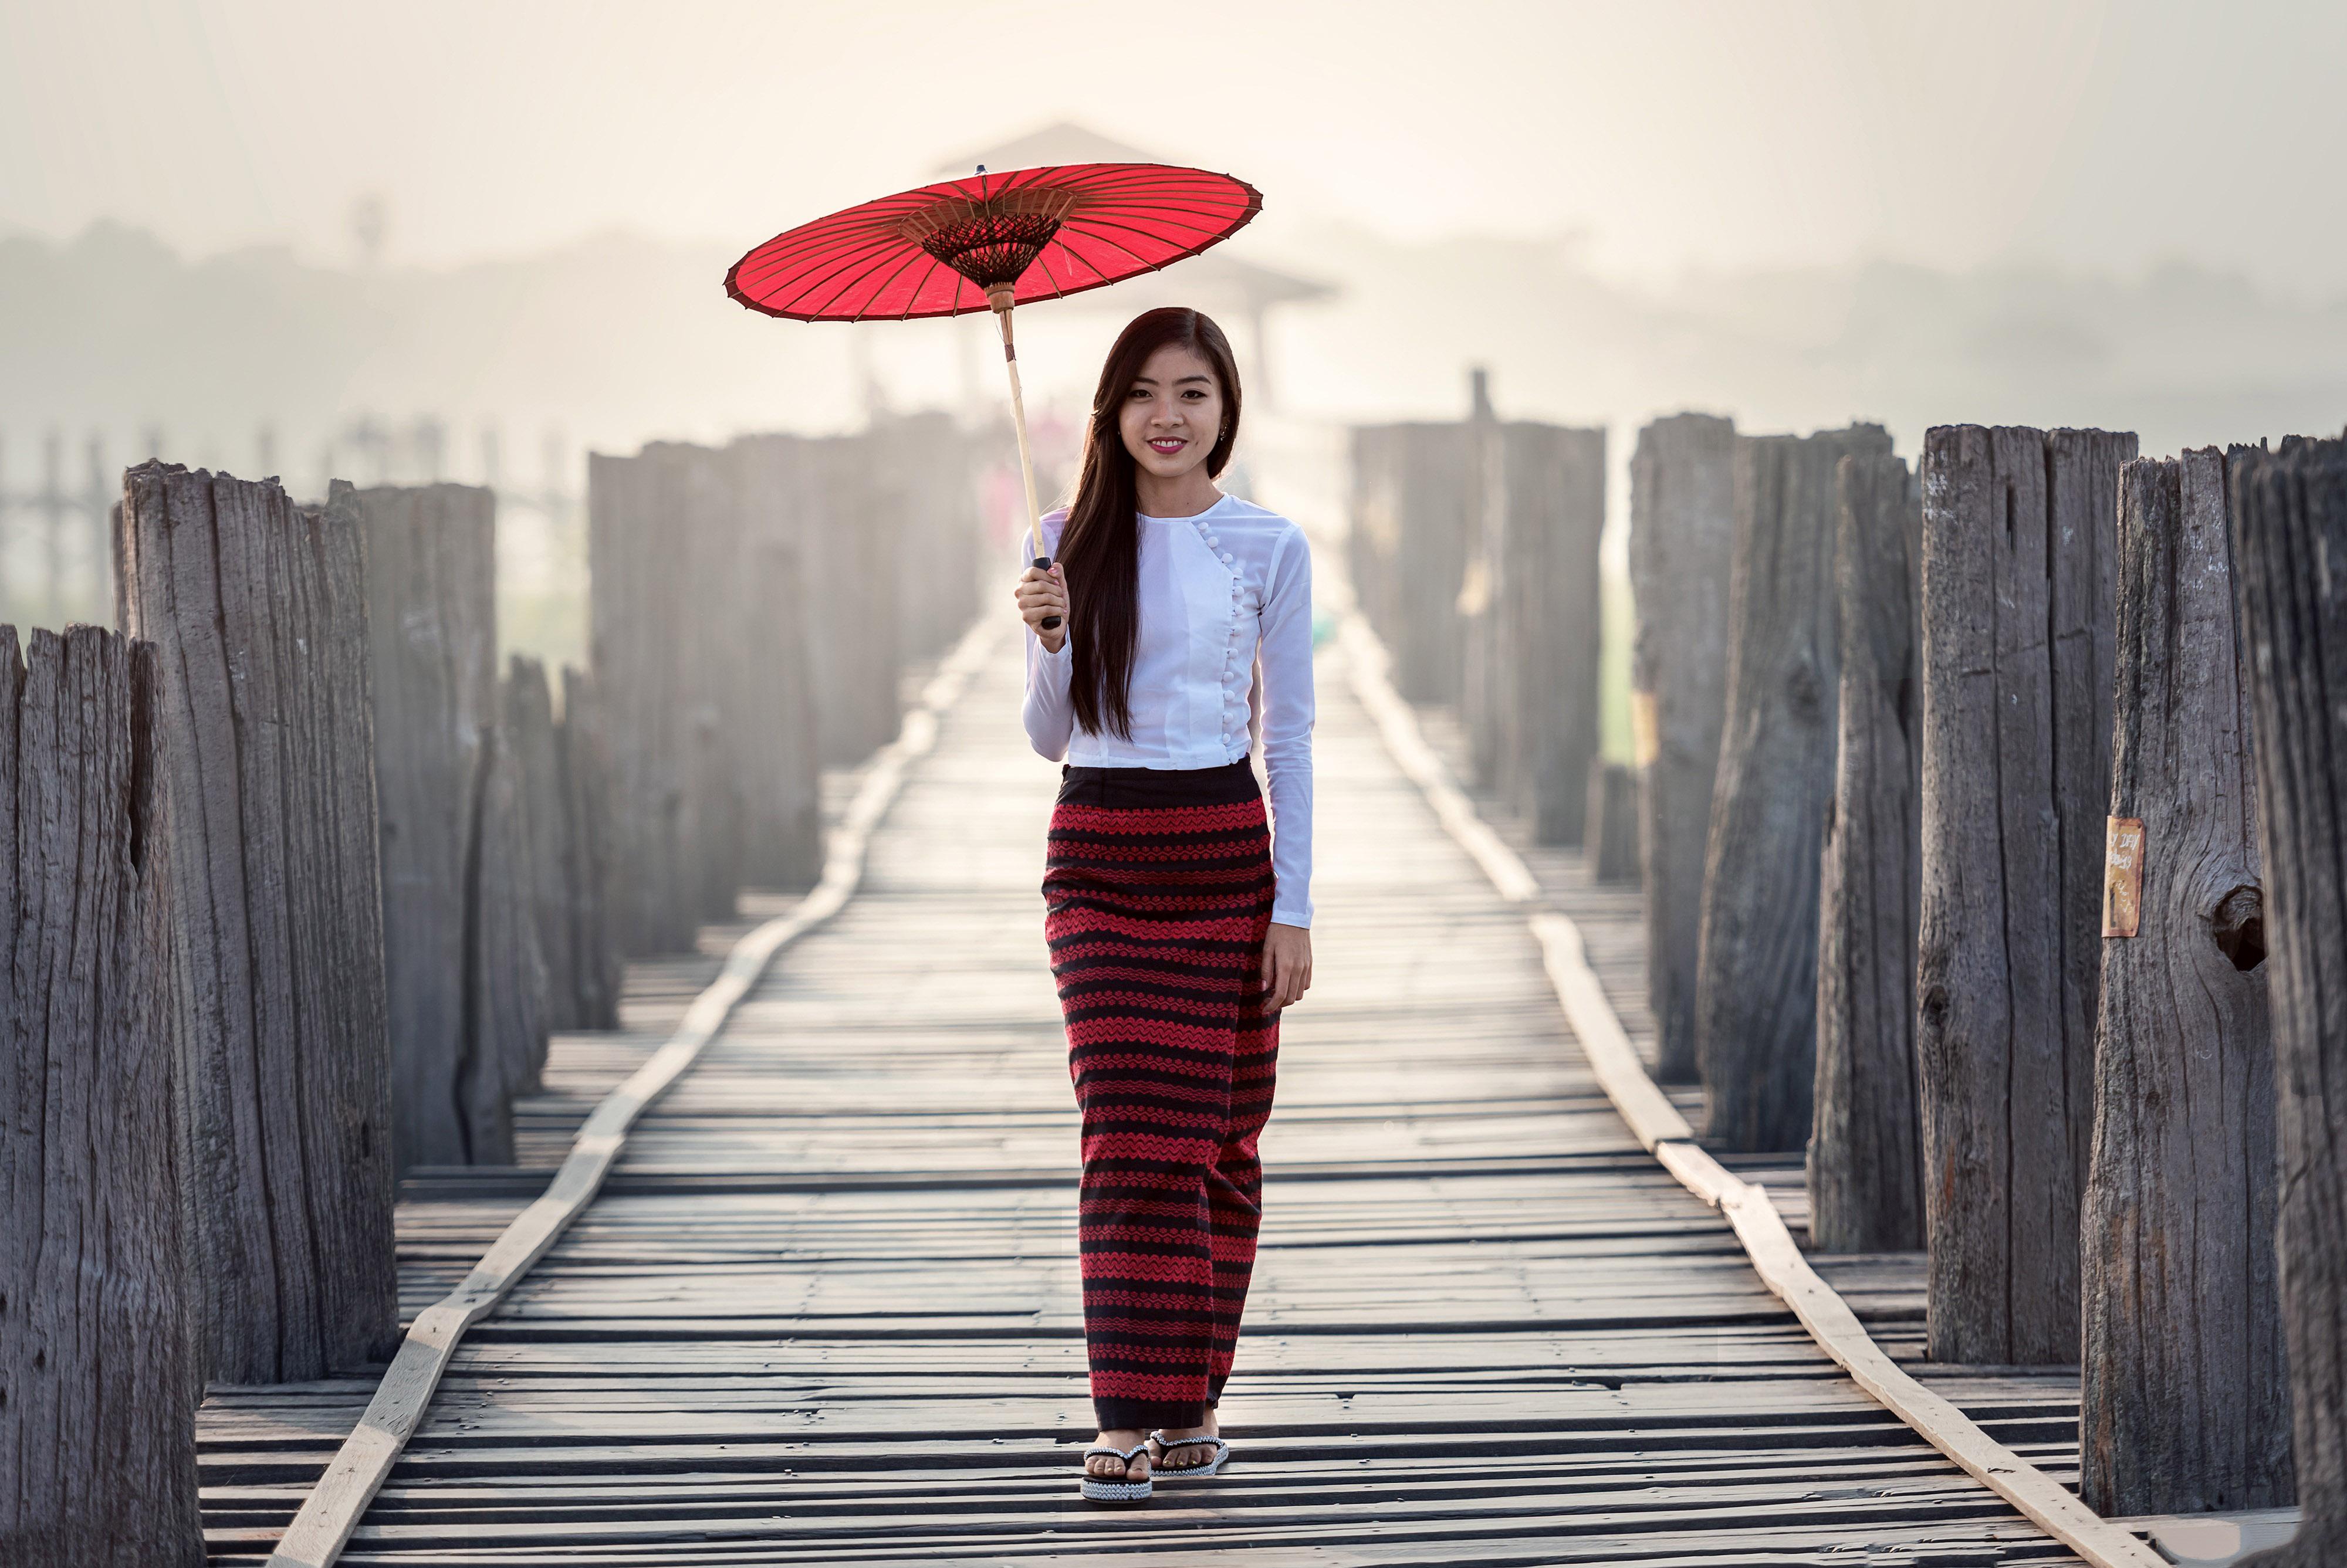 Pretty Asian In The Rain With Red Umbrella Image Free